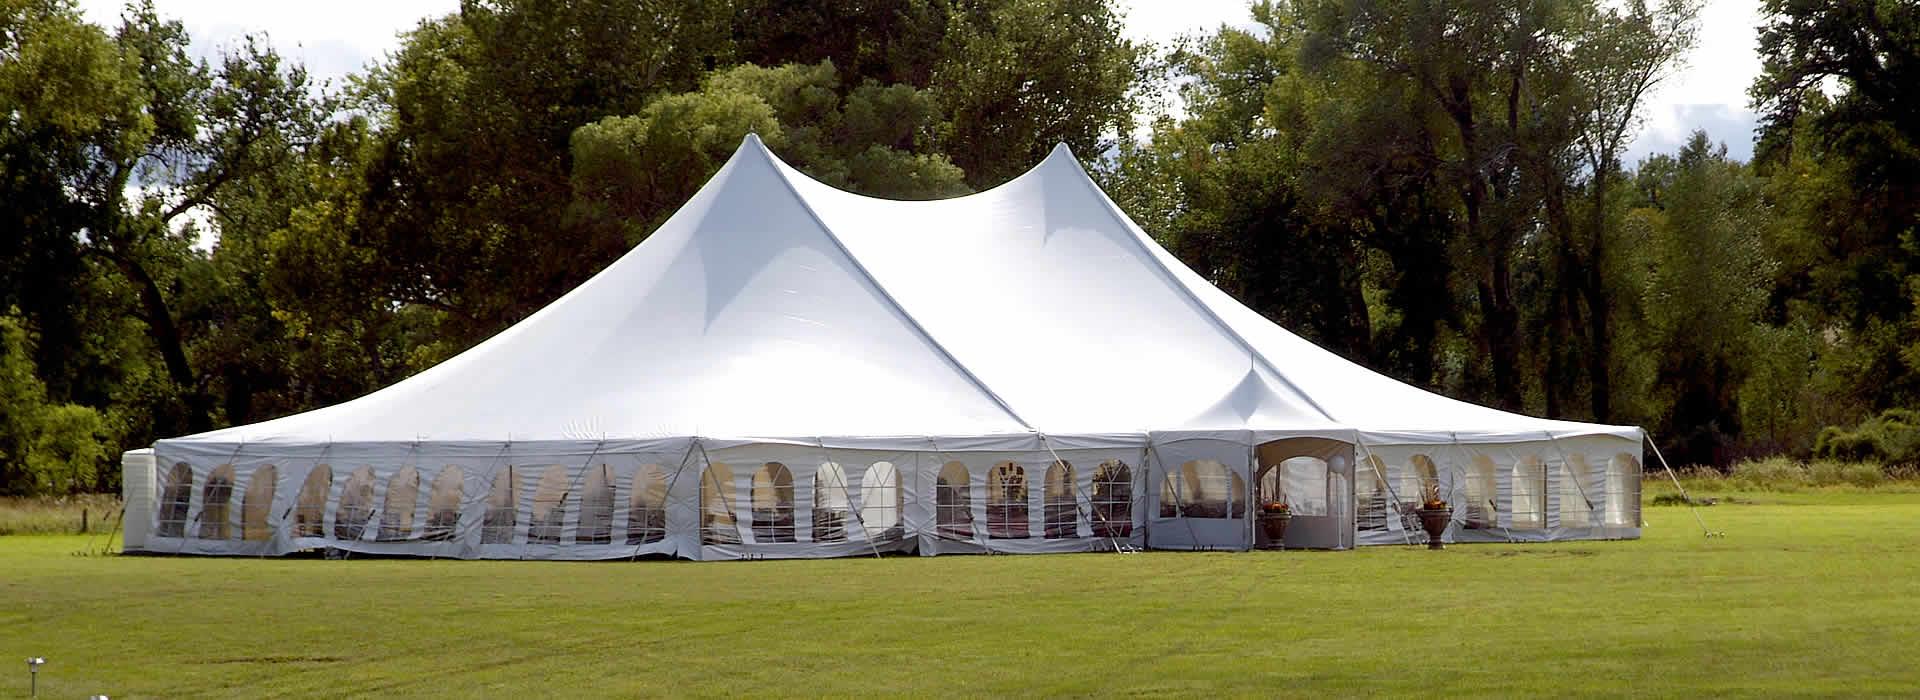 Peg & Pole Tents